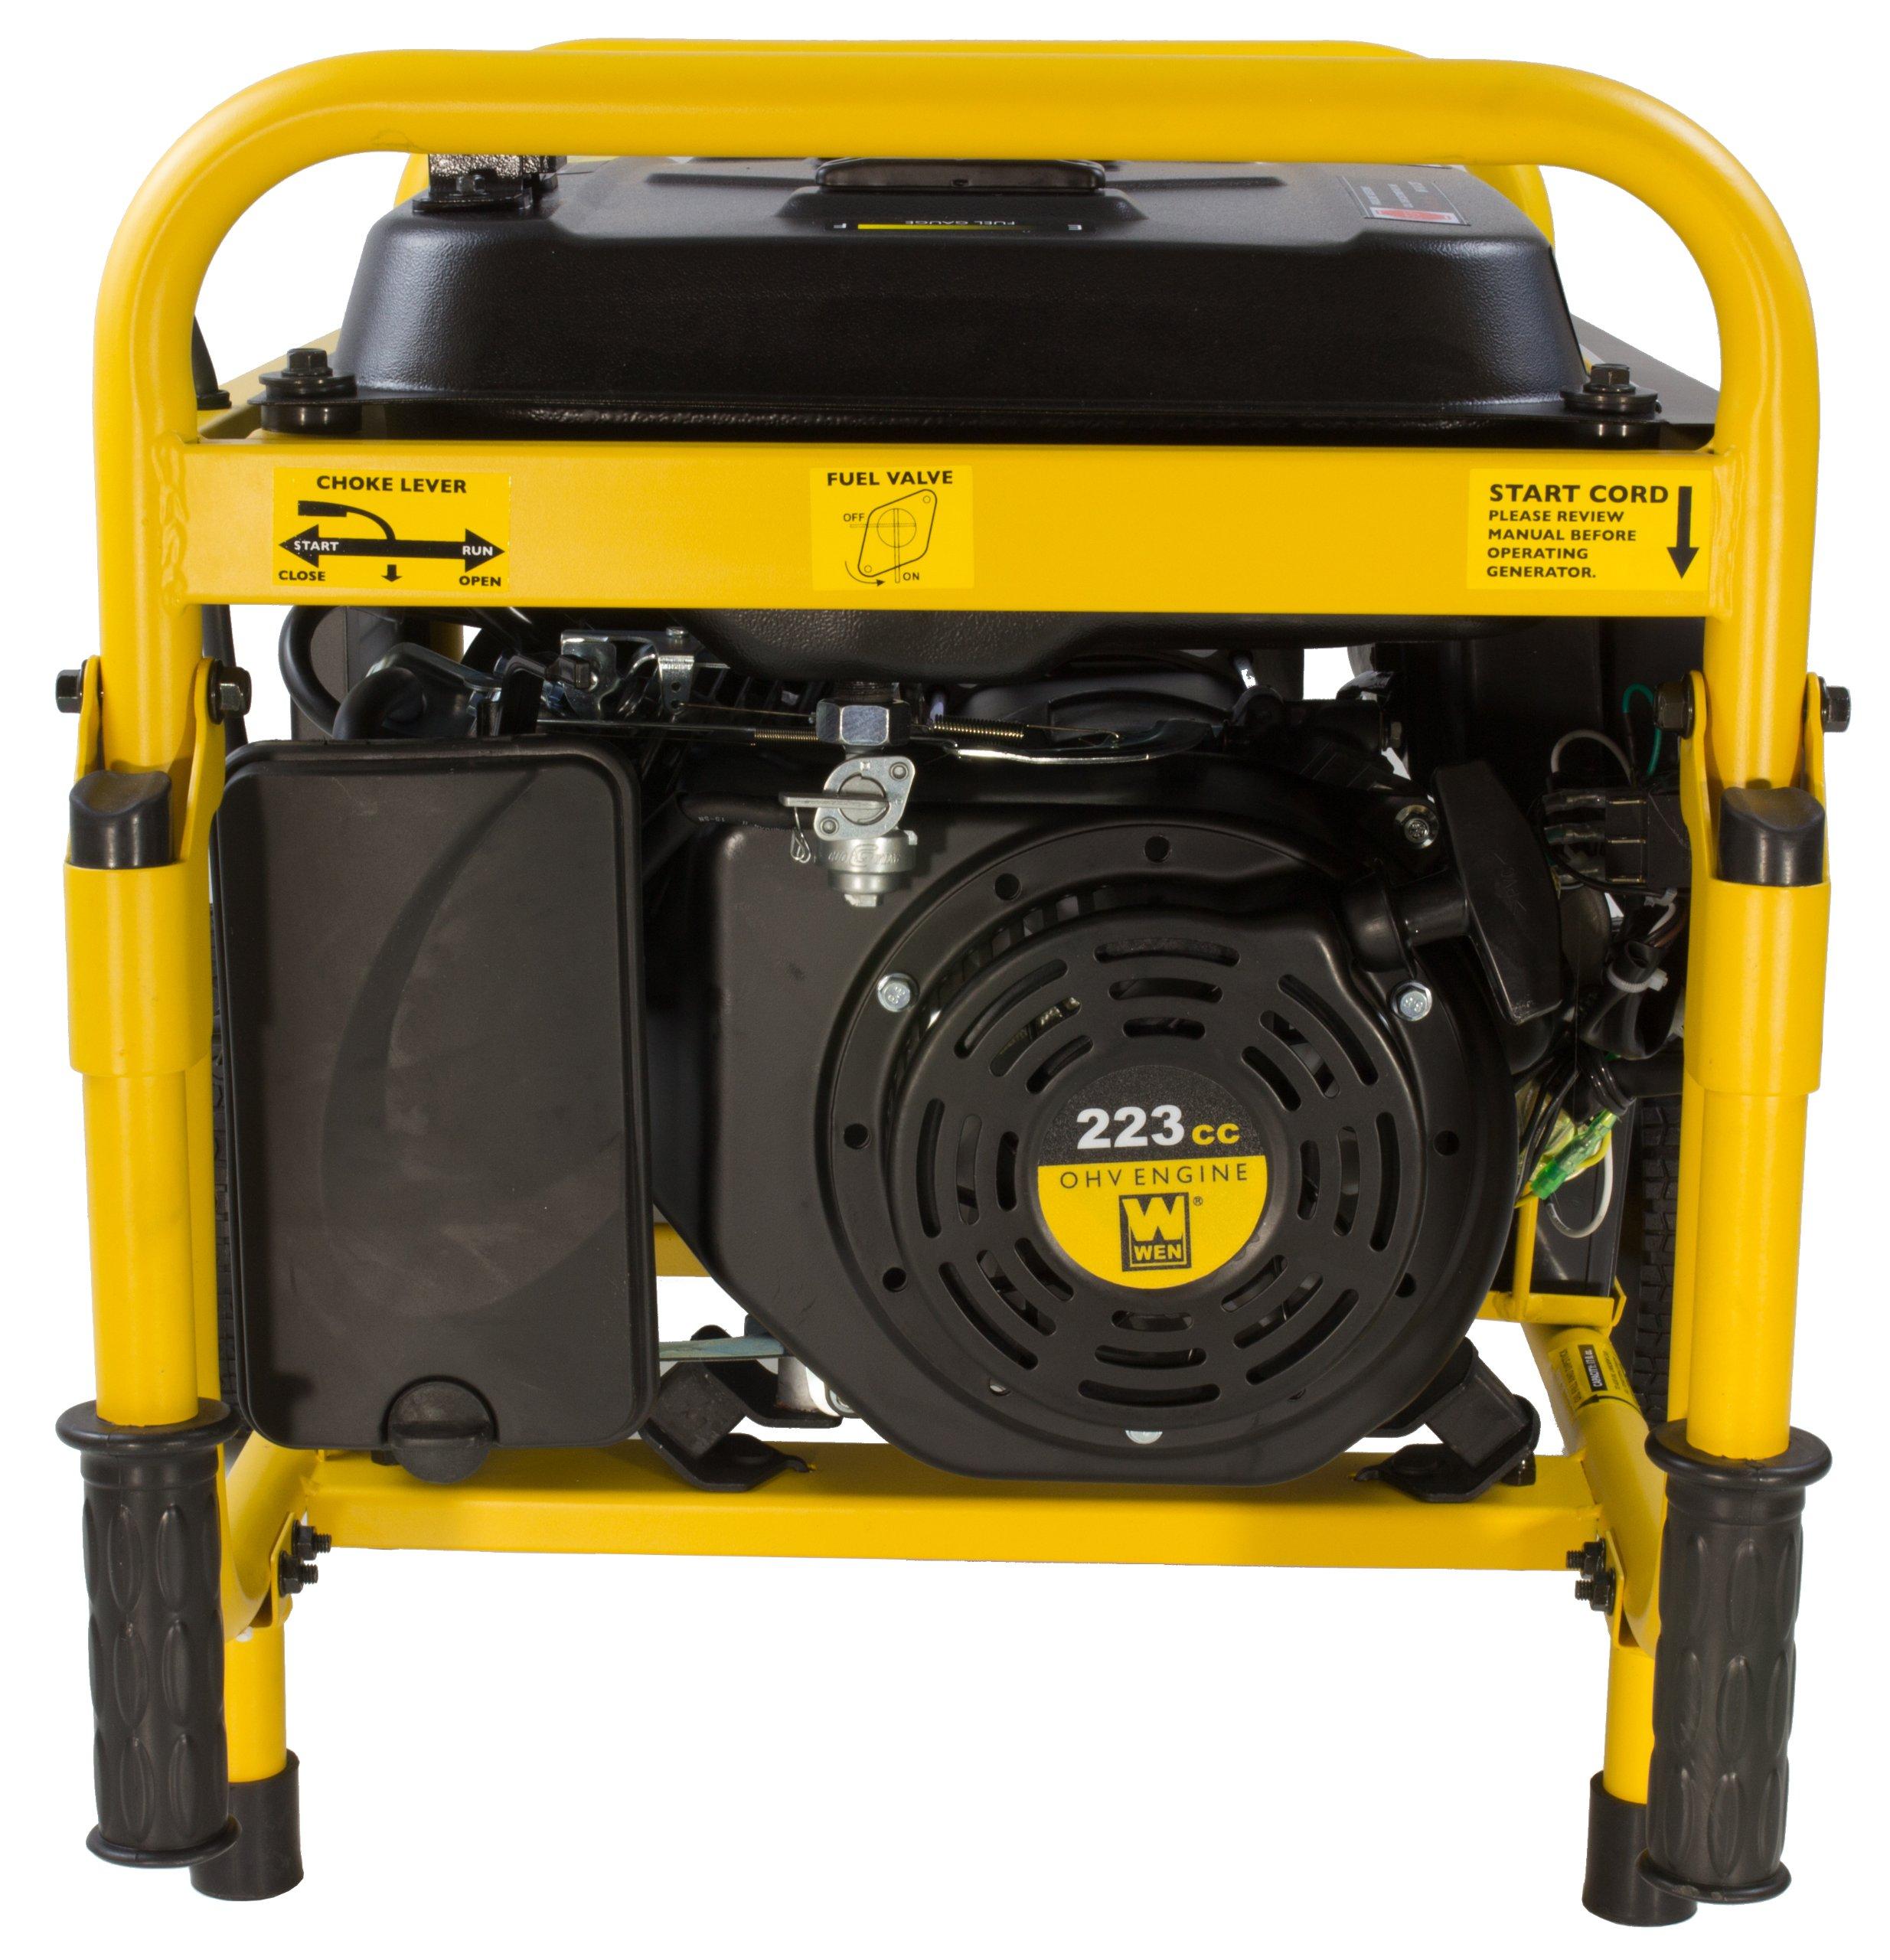 WEN 56475, 3750 Running Watts/4750 Starting Watts, Gas Powered Portable Generator, CARB Compliant